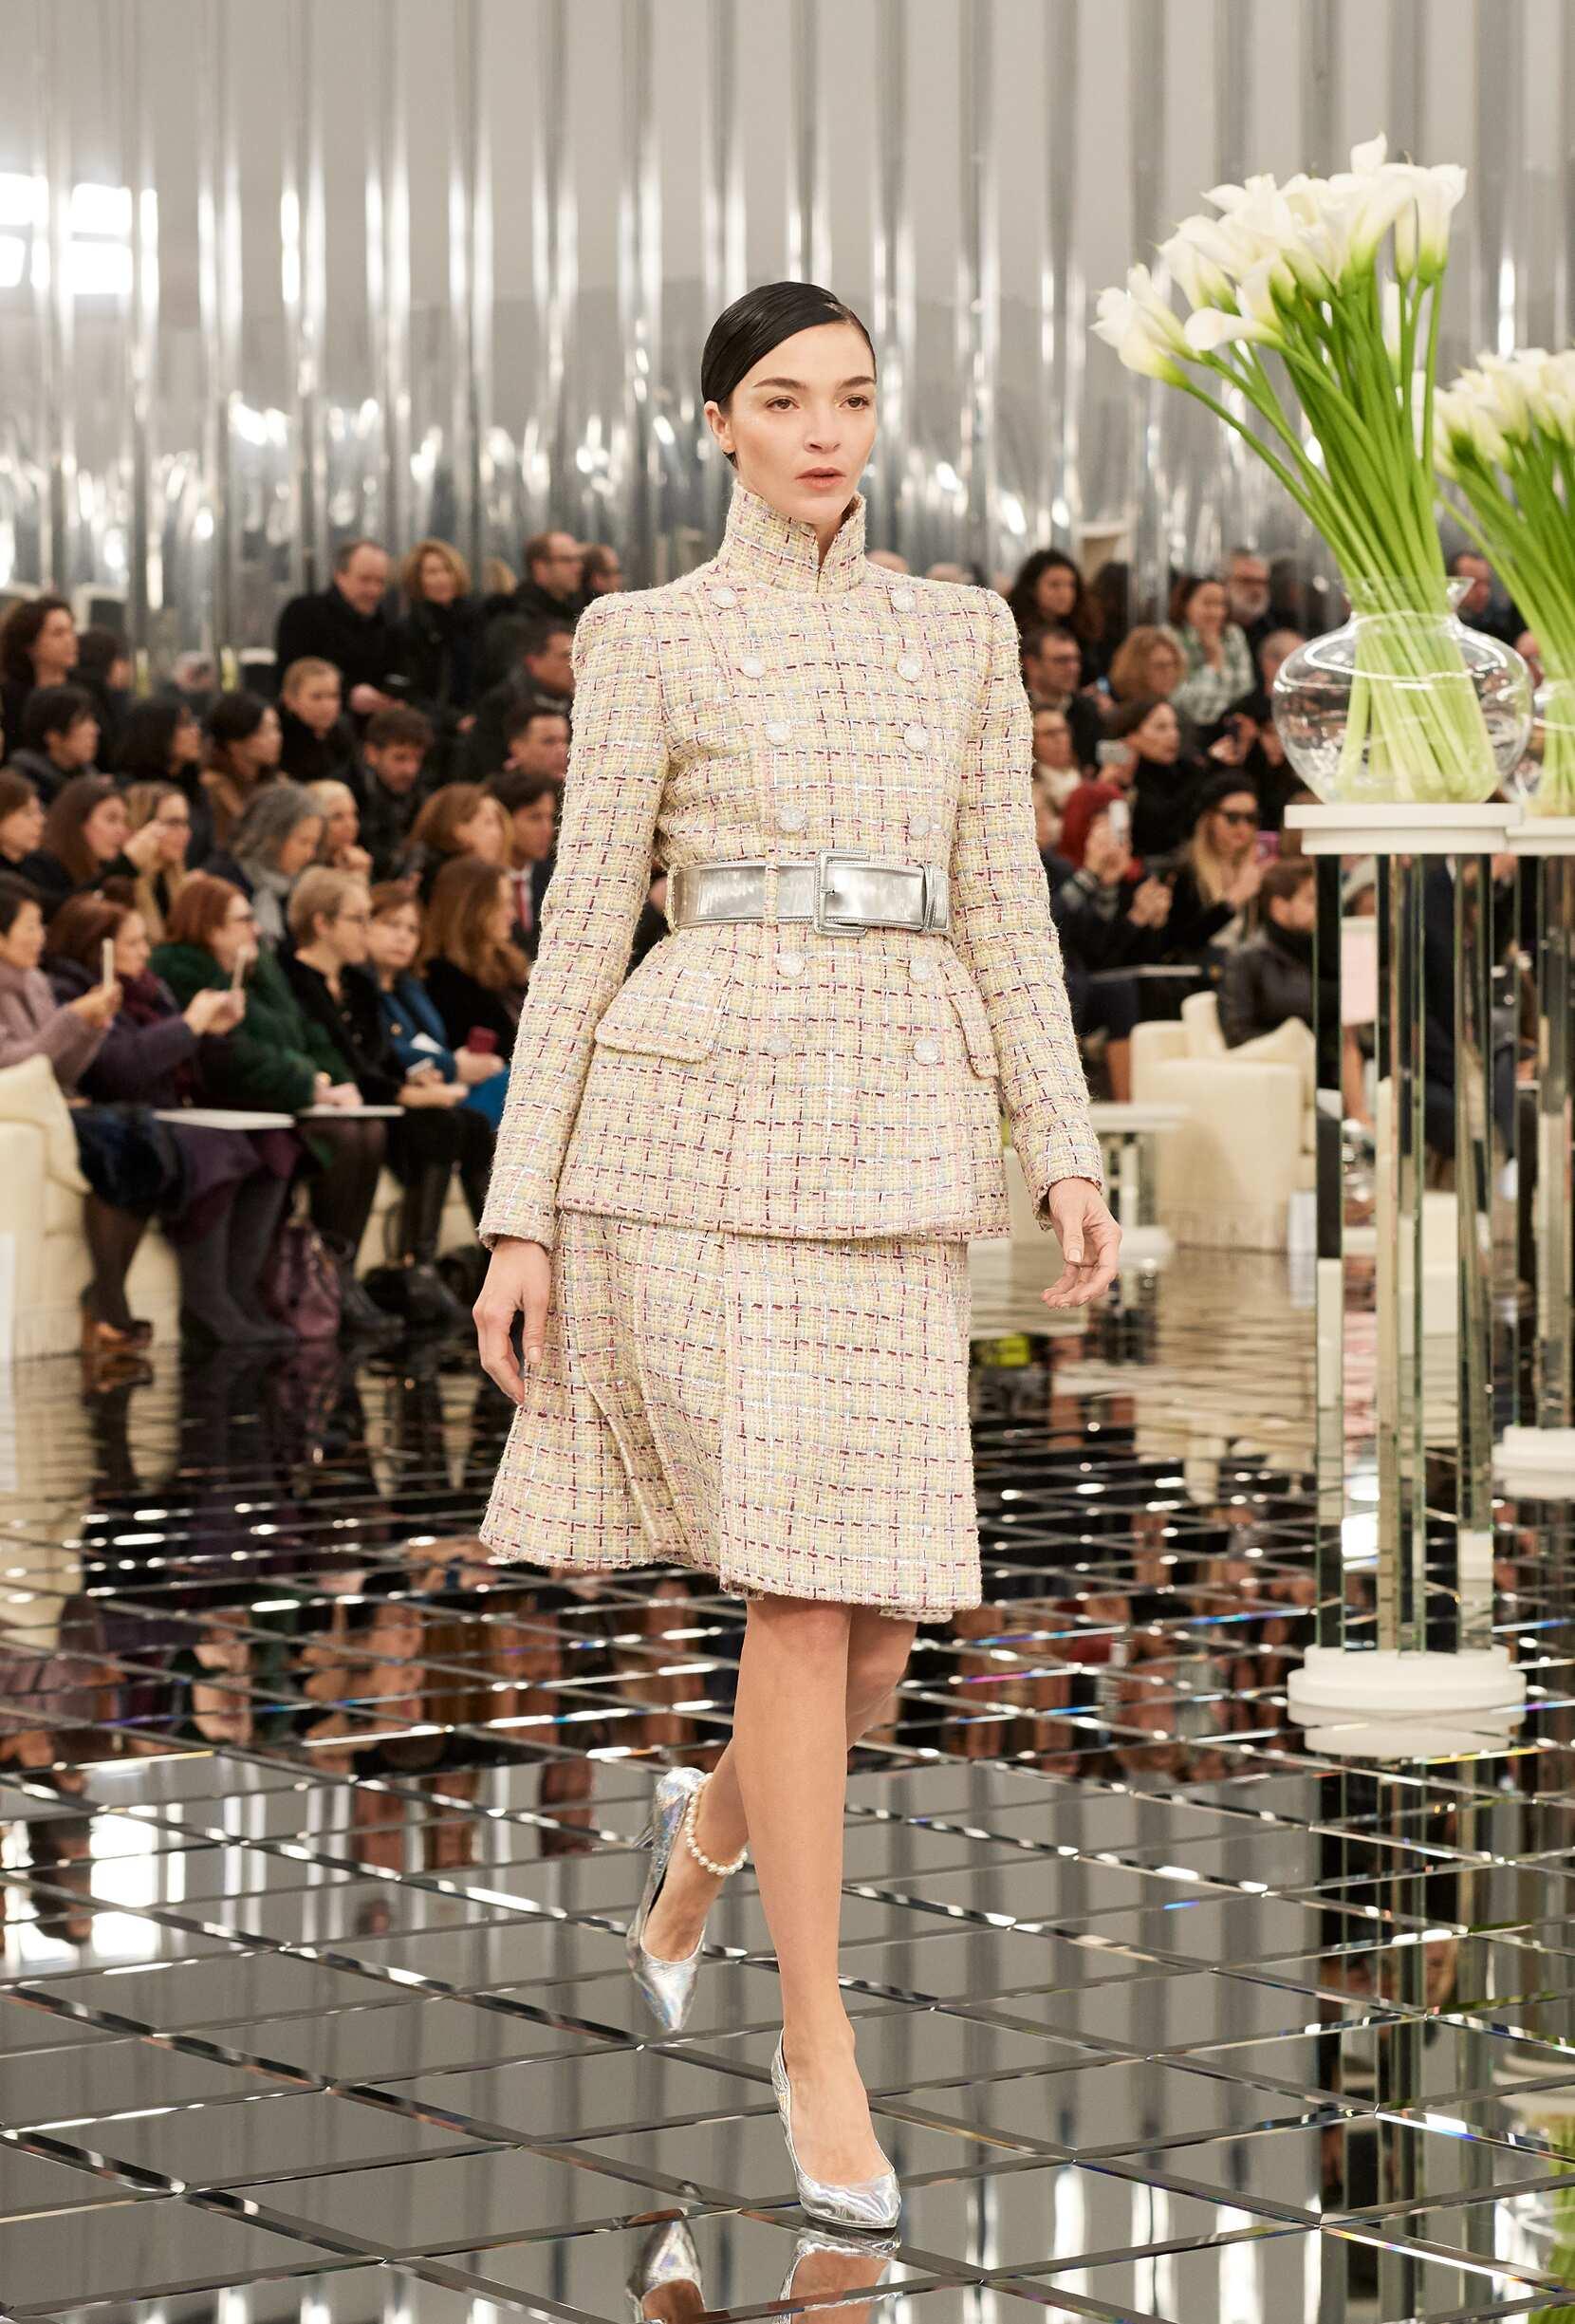 Woman SS 2017 Fashion Show Chanel Haute Couture